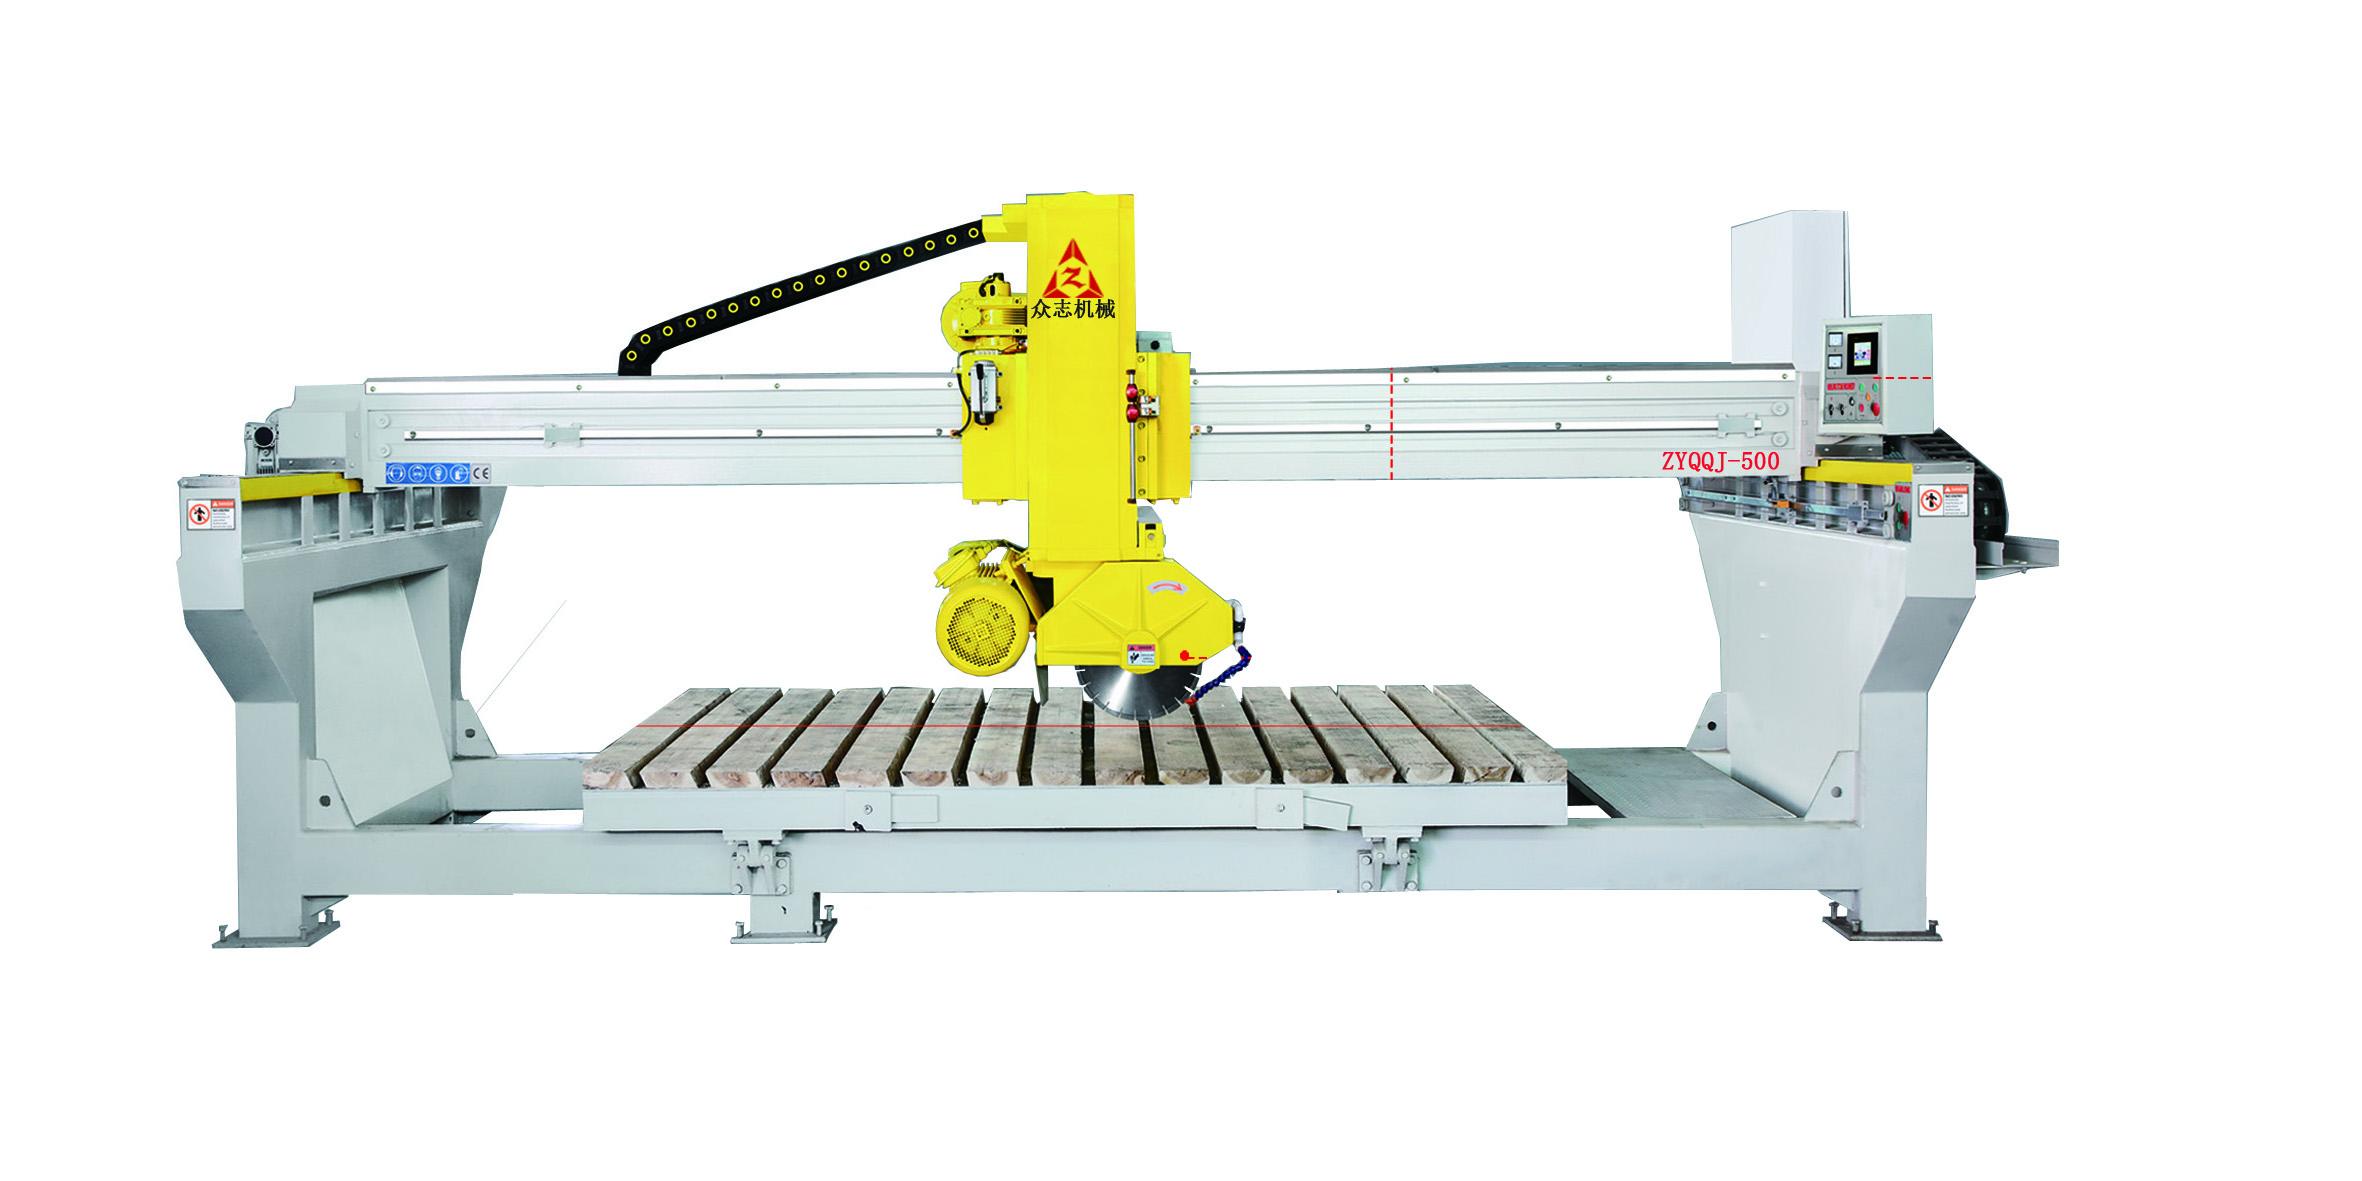 ZYQQJ-500 Mono-Block Bridge Cutting Machine